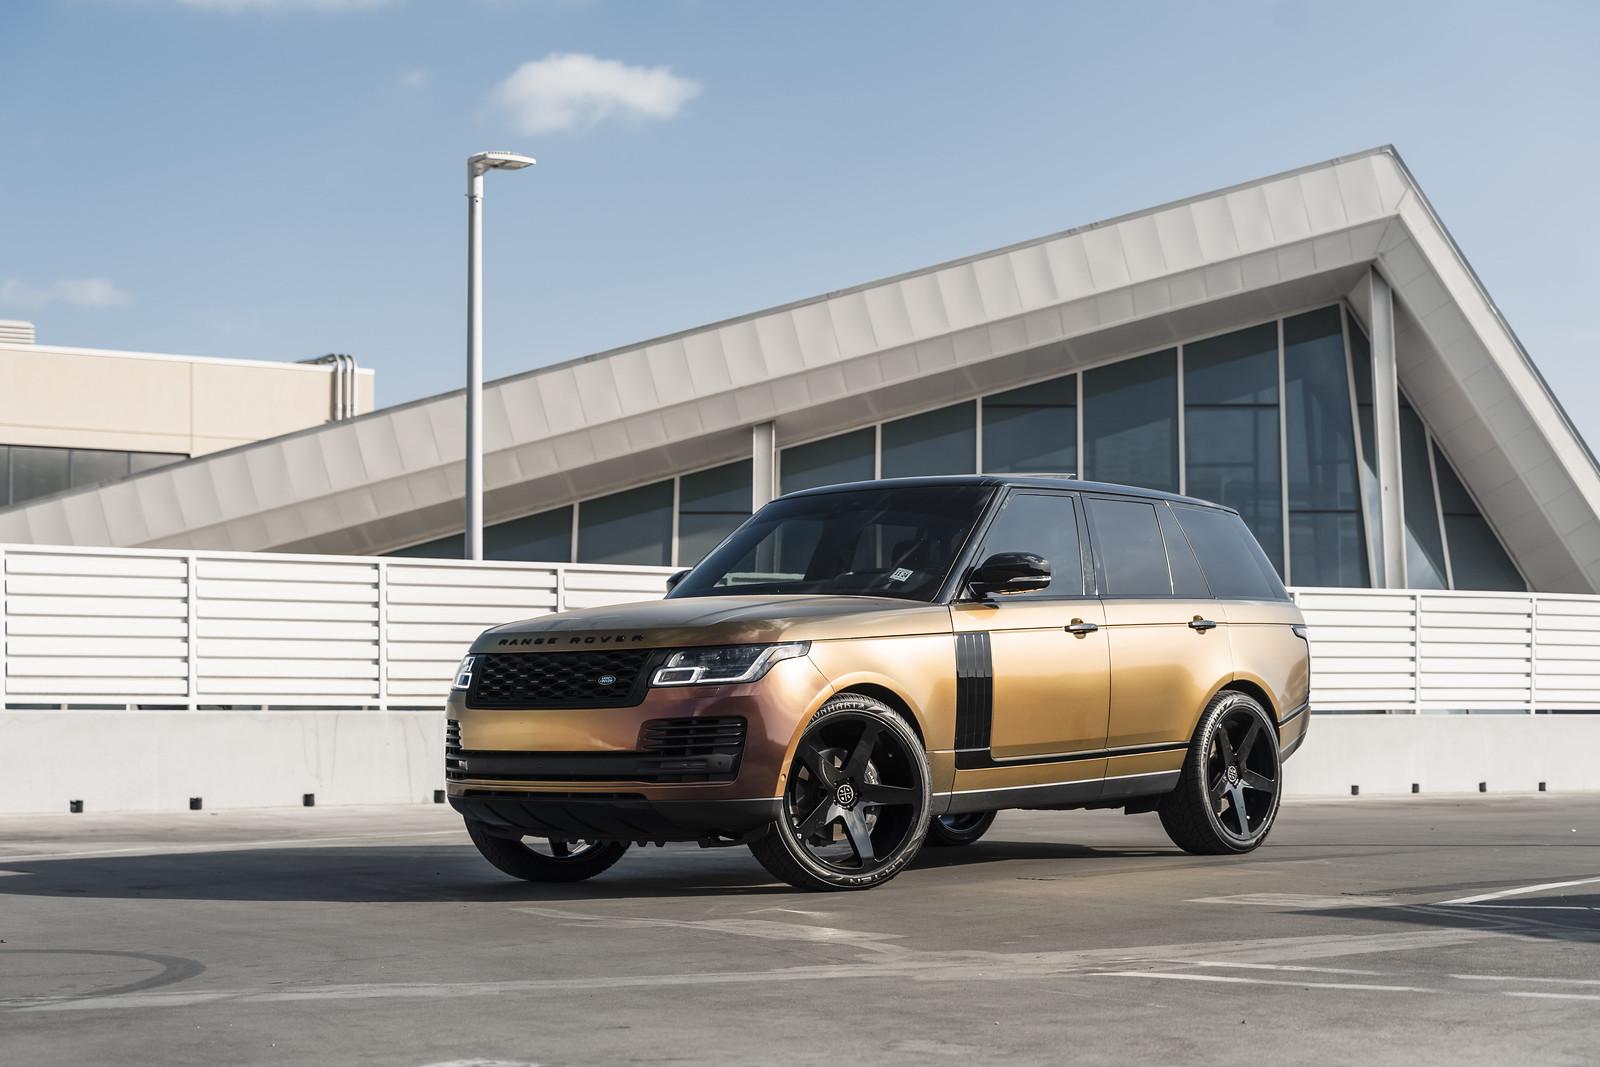 2020_Land_Rover_Range_Rover_HSC_BD15_Gloss_Black_4